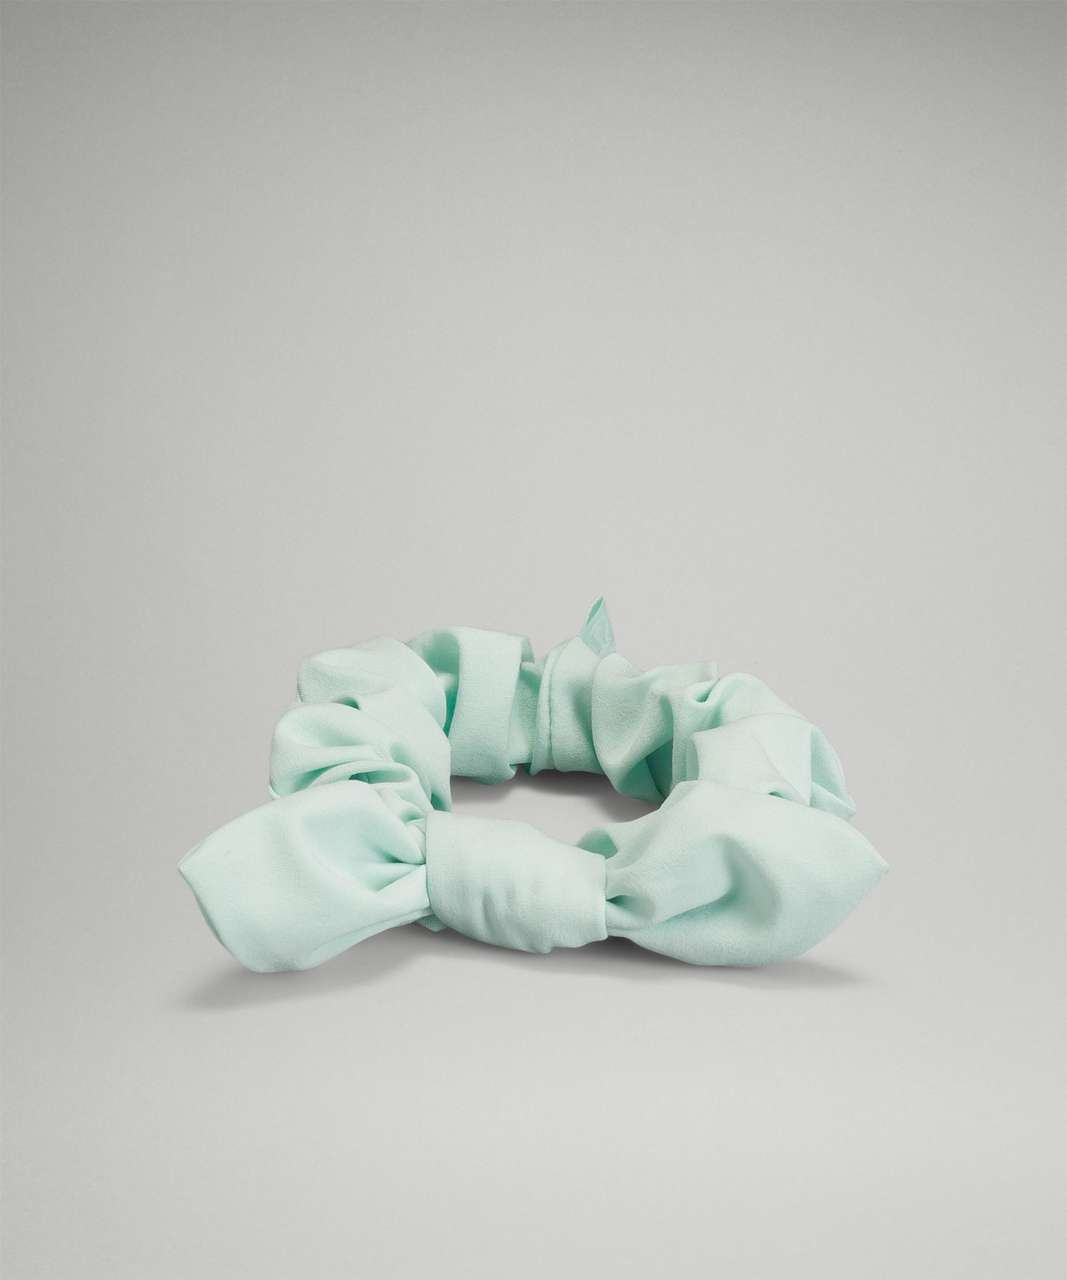 Lululemon Uplifting Scrunchie *Bow - Delicate Mint